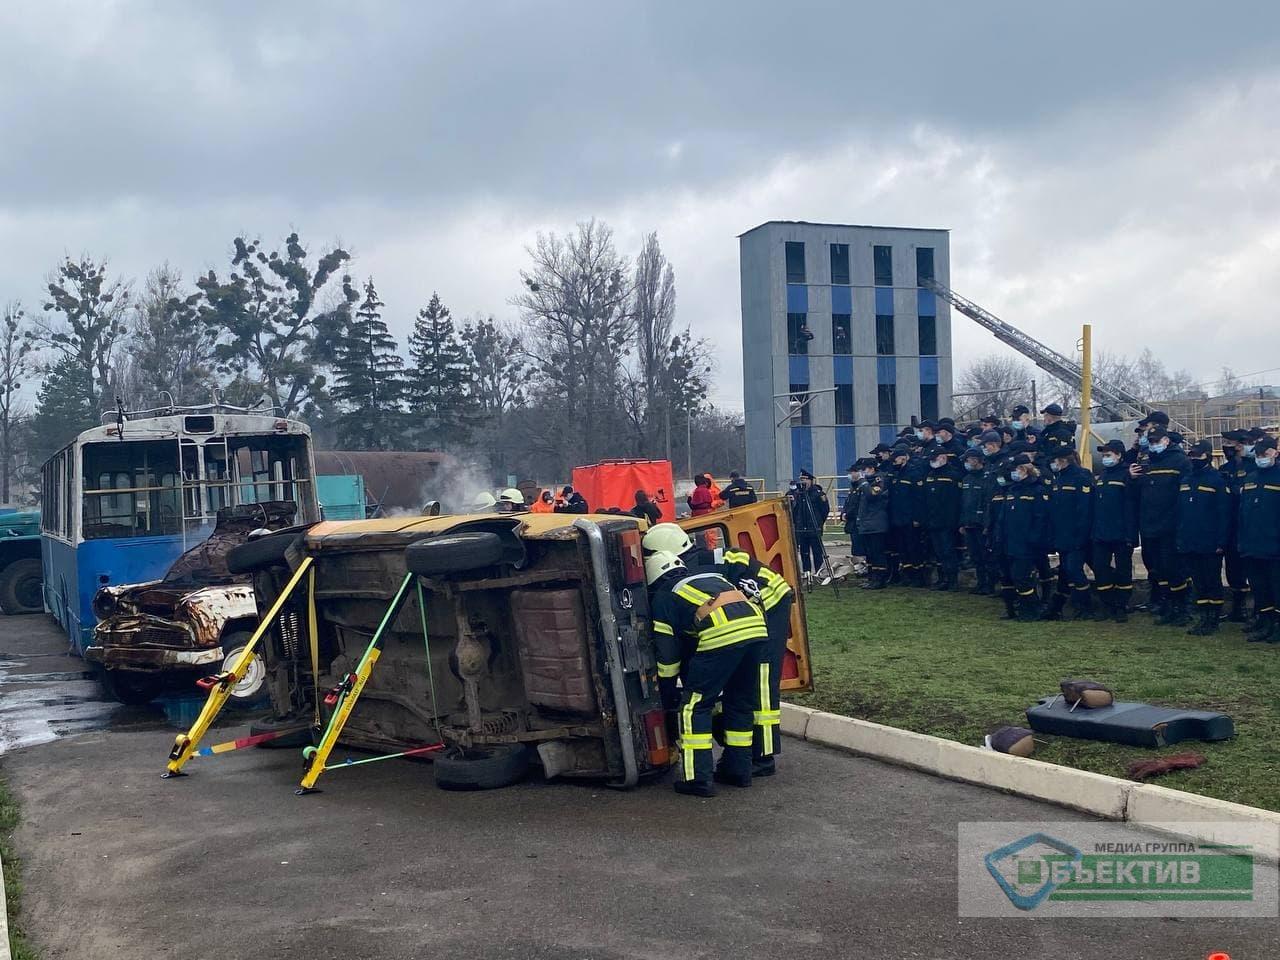 В Харькове тушат самолет АН-26 и ликвидируют последствия химической аварии (фото, видео)